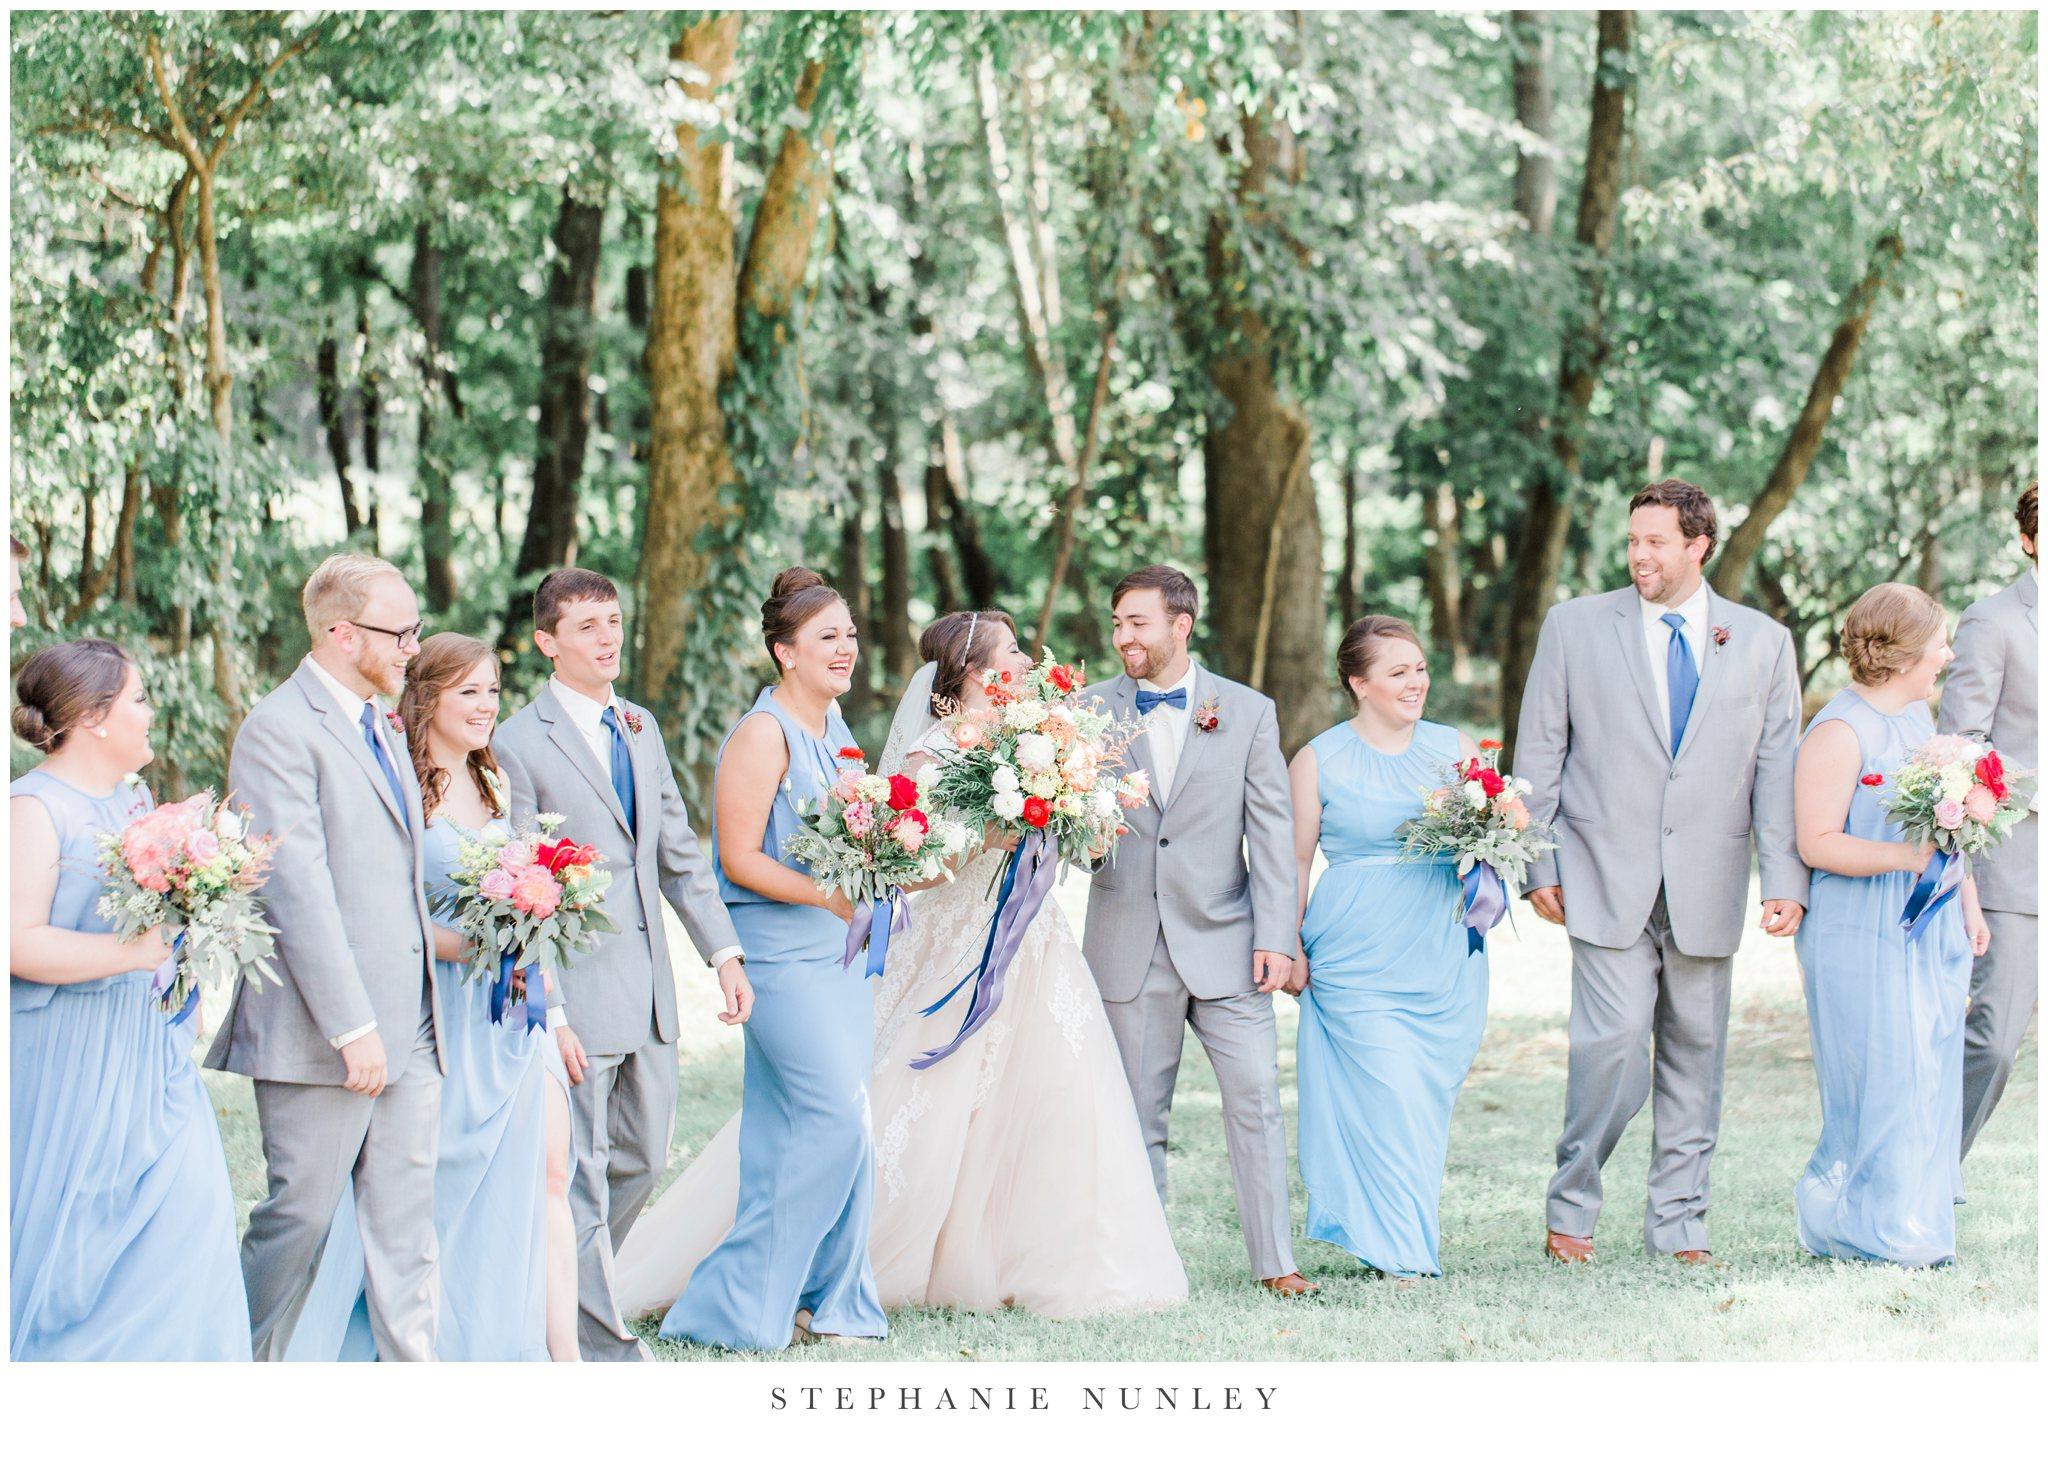 arkansas-wedding-with-lush-wildflower-bouquet-0077.jpg